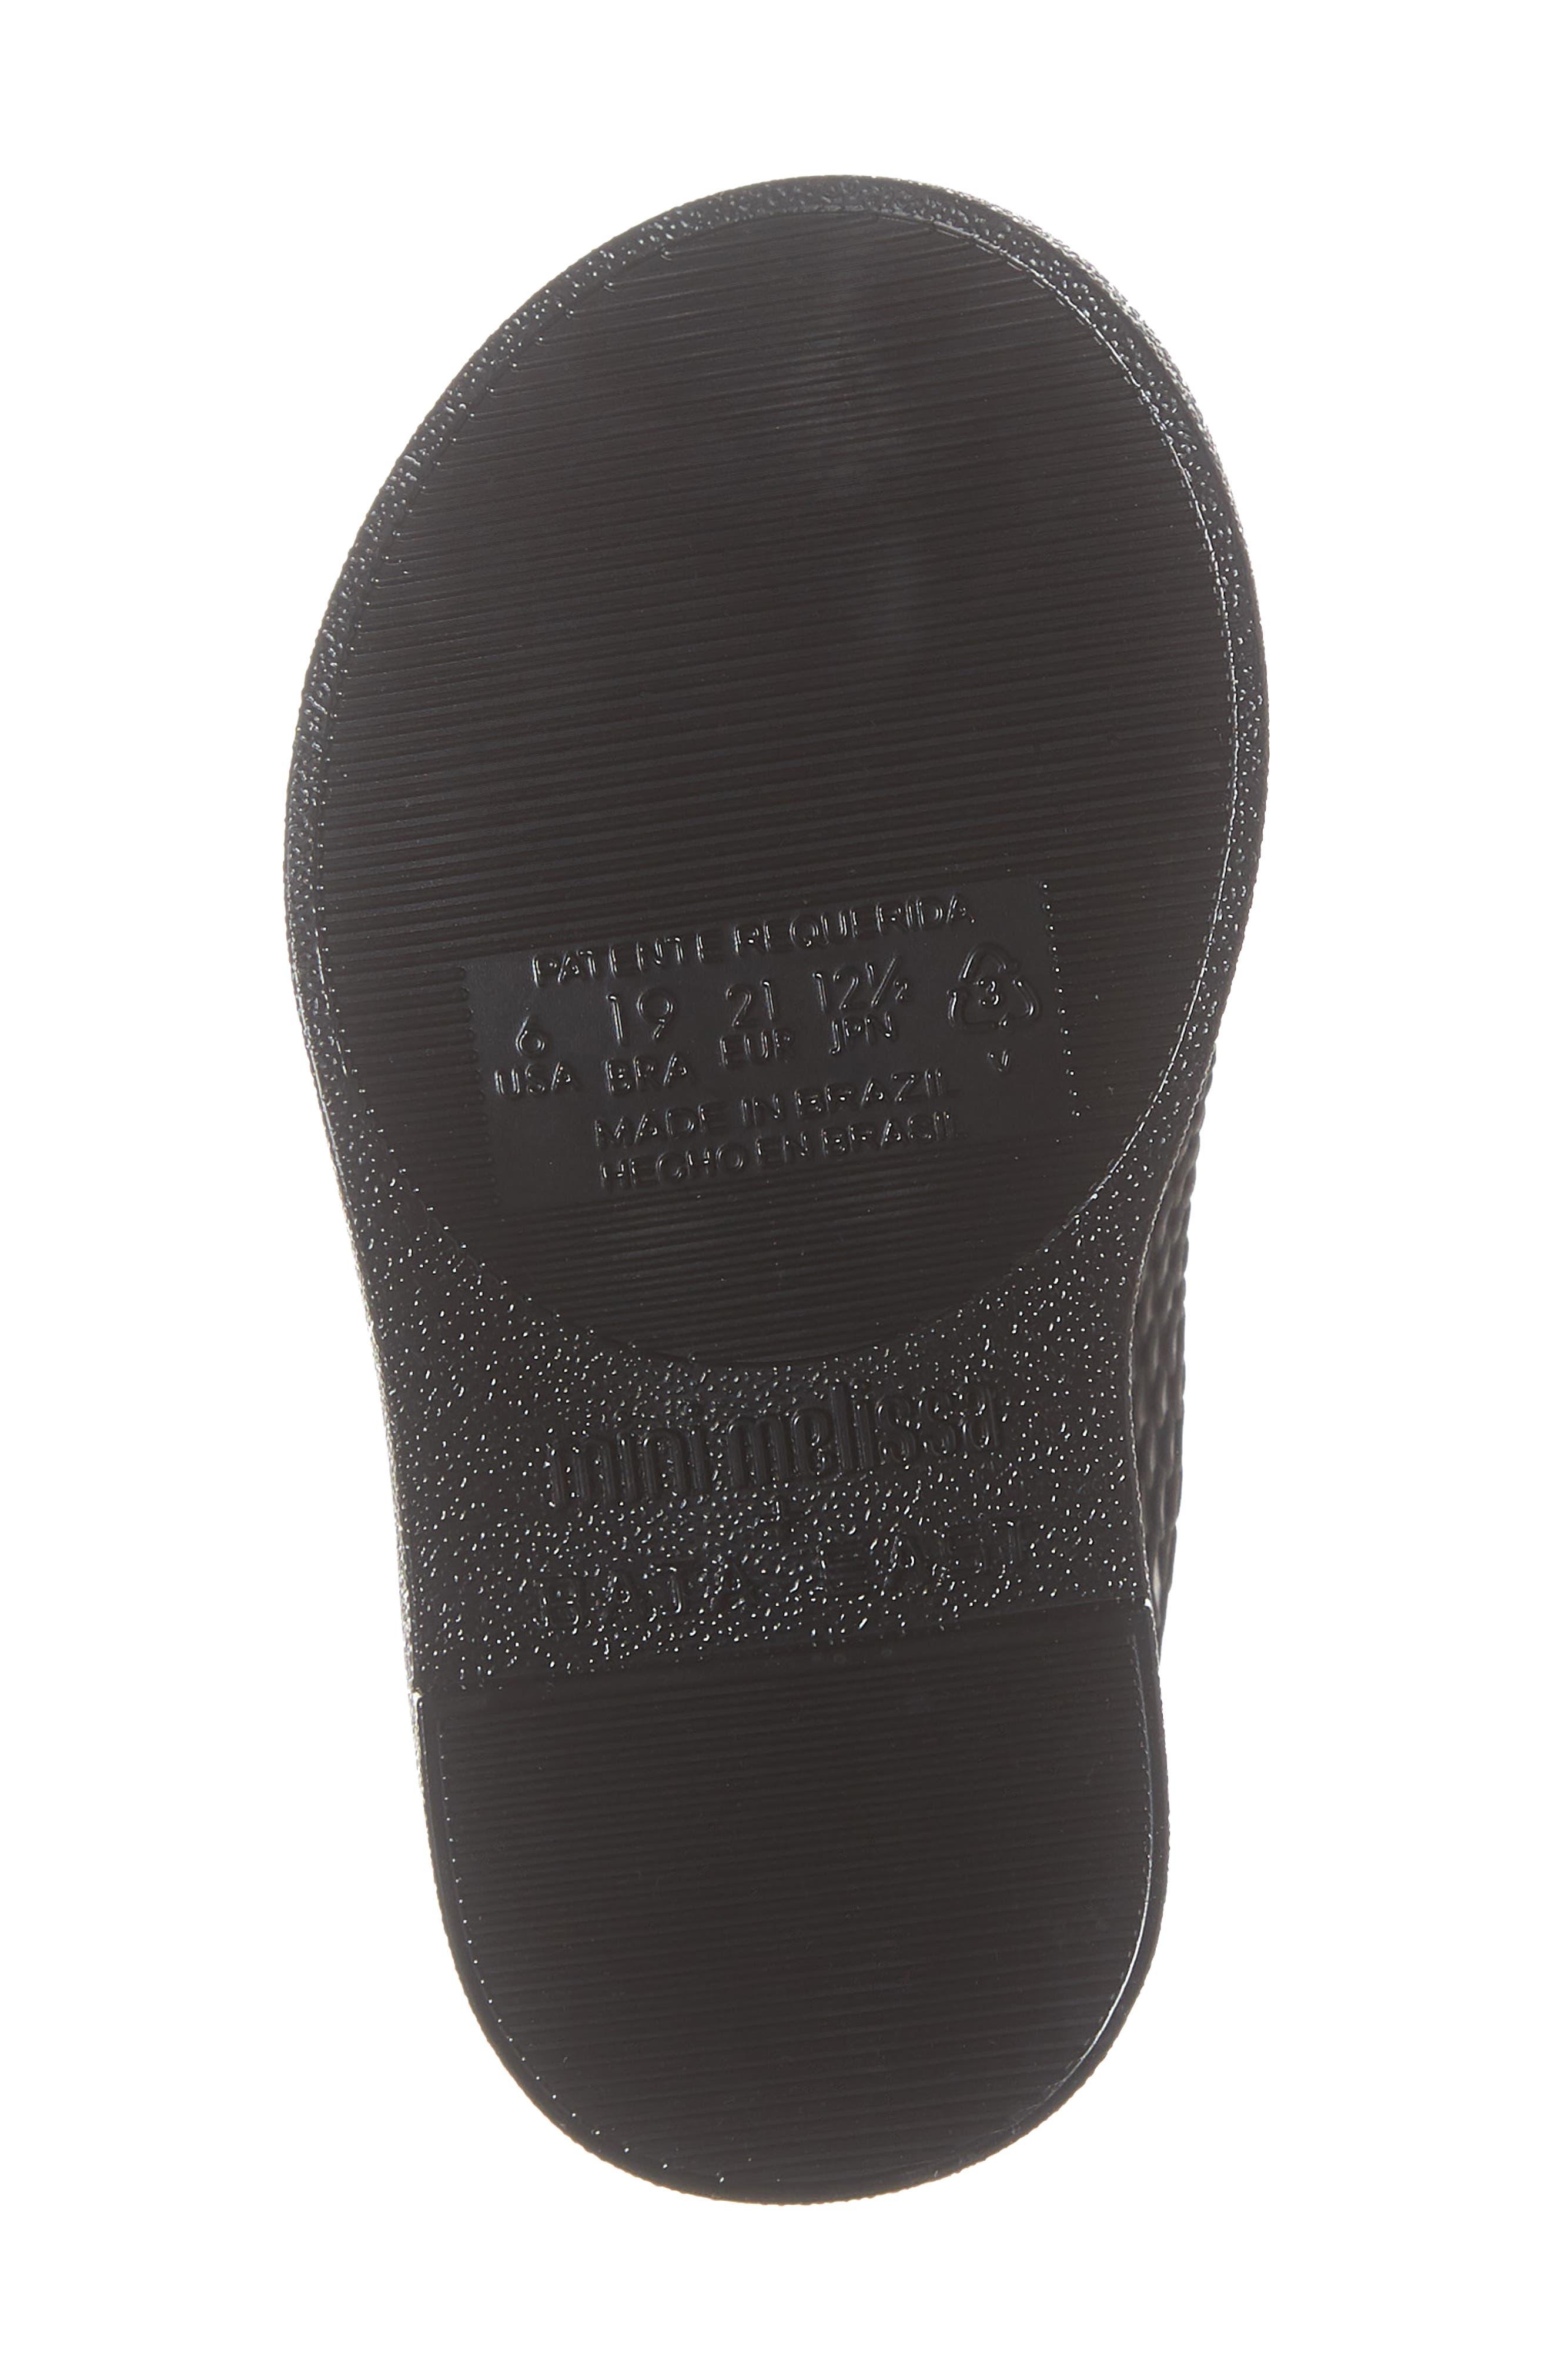 Python Textured Water Resistant Bootie,                             Alternate thumbnail 6, color,                             BLACK